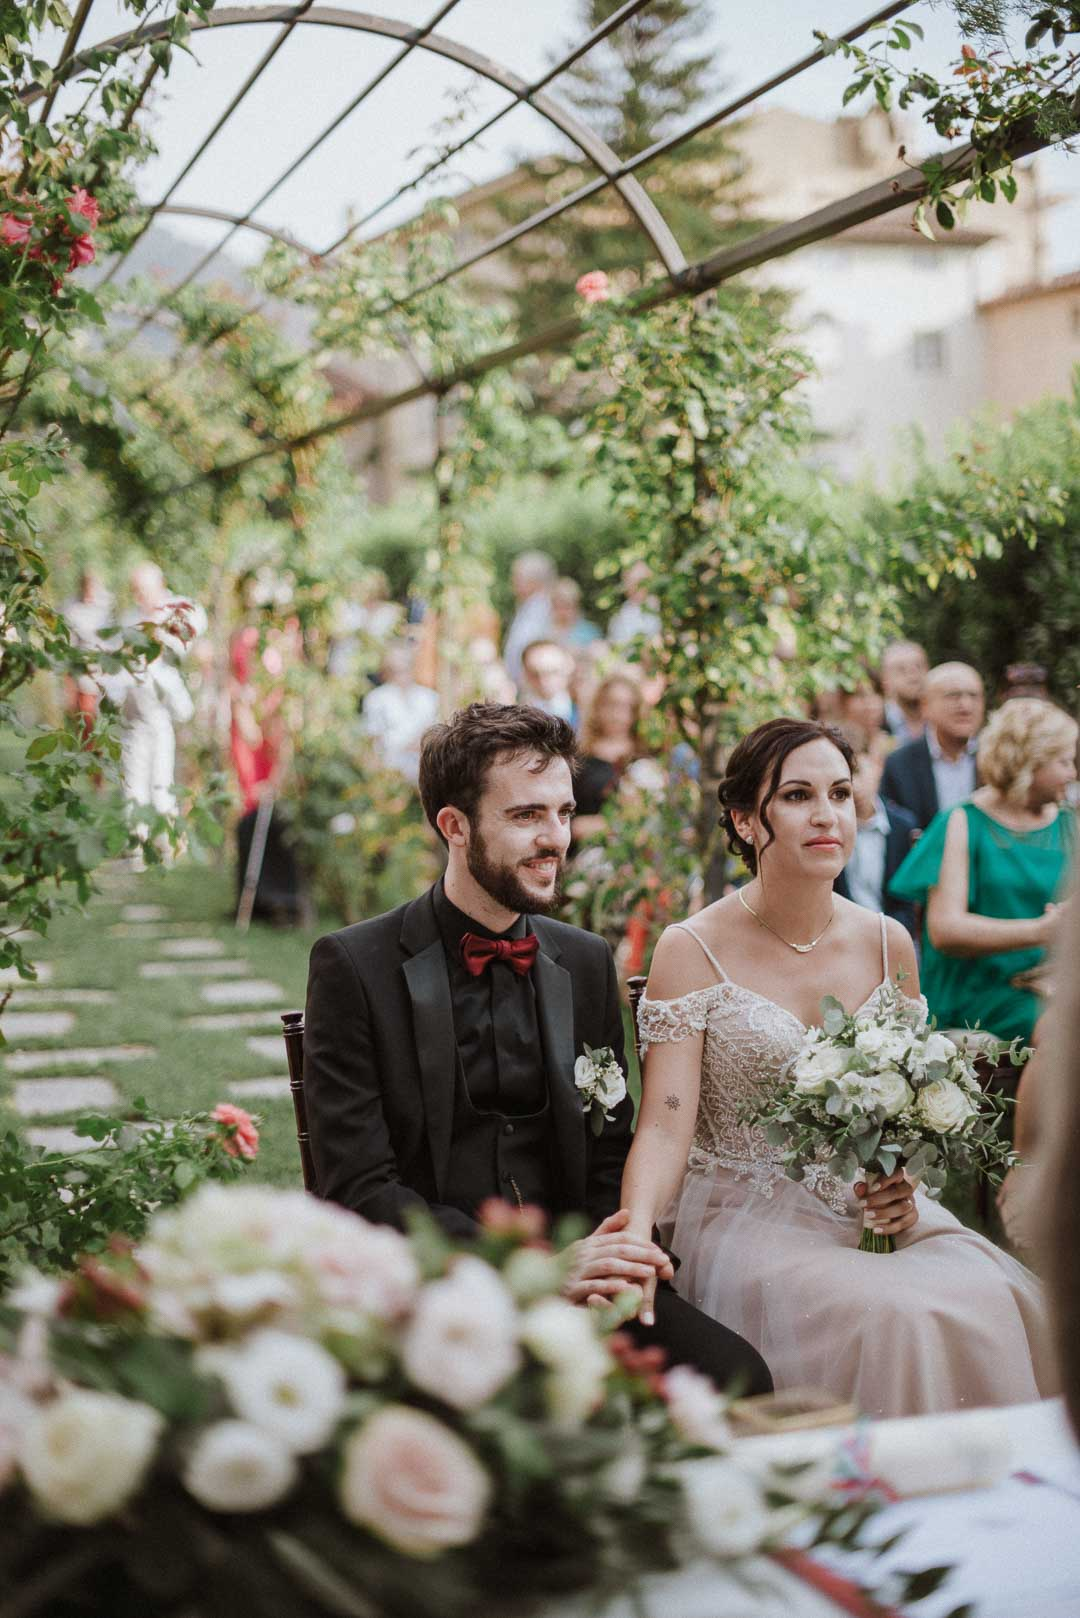 wedding-photographer-destination-fineart-bespoke-reportage-tuscany-villascorzi-vivianeizzo-spazio46-80